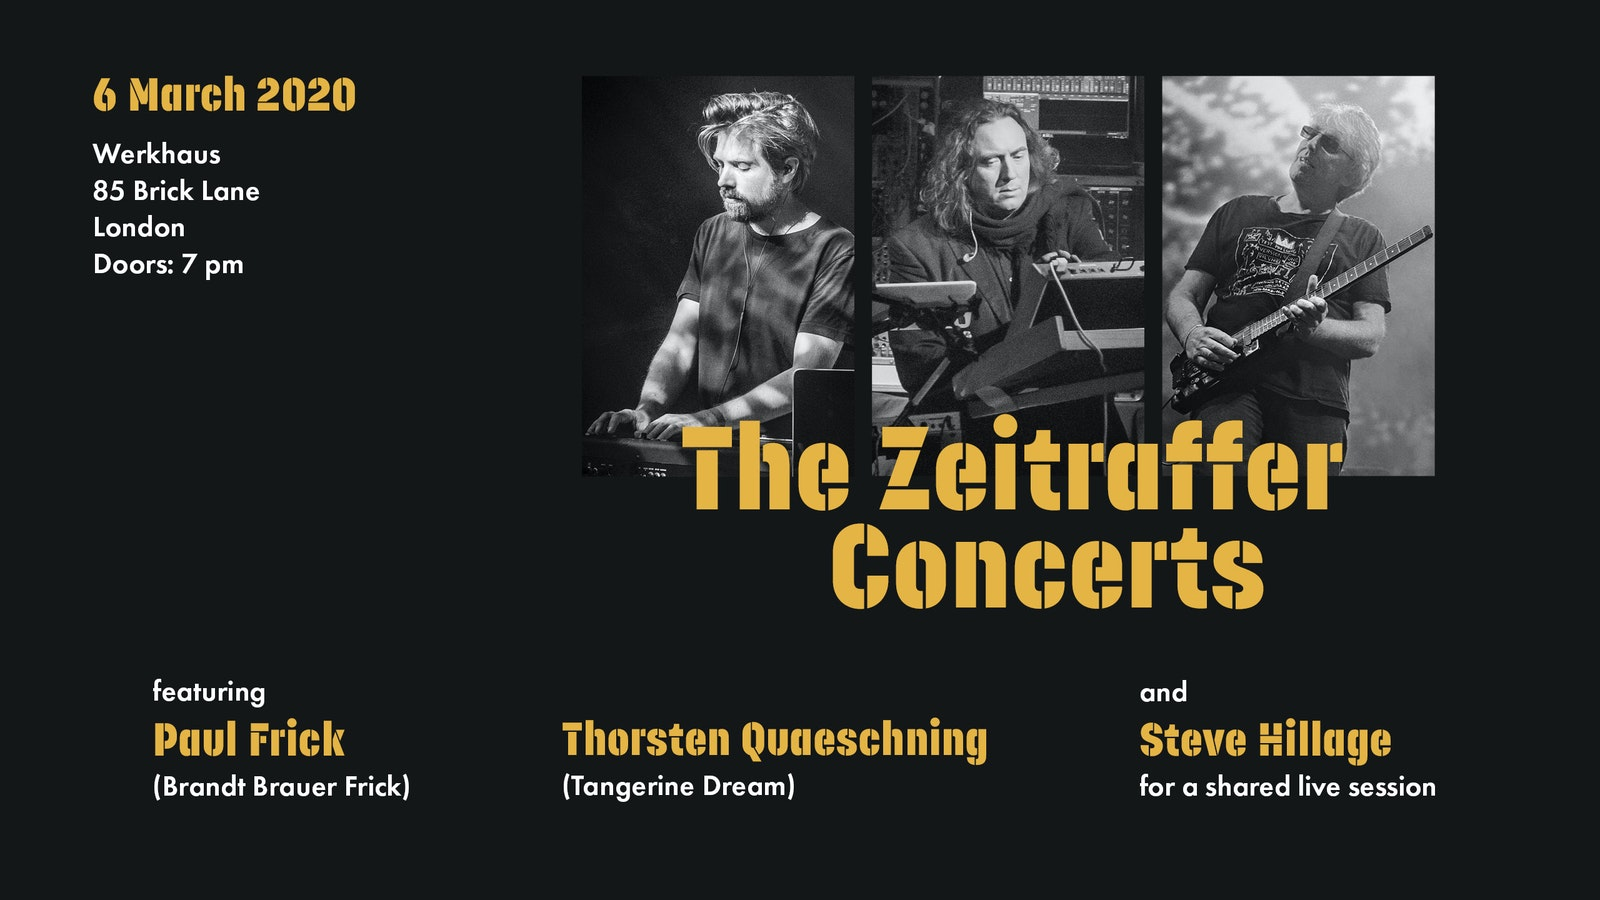 The Zeitraffer Concerts: Thorsten Quaeschning, Paul Frick & Steve Hillage